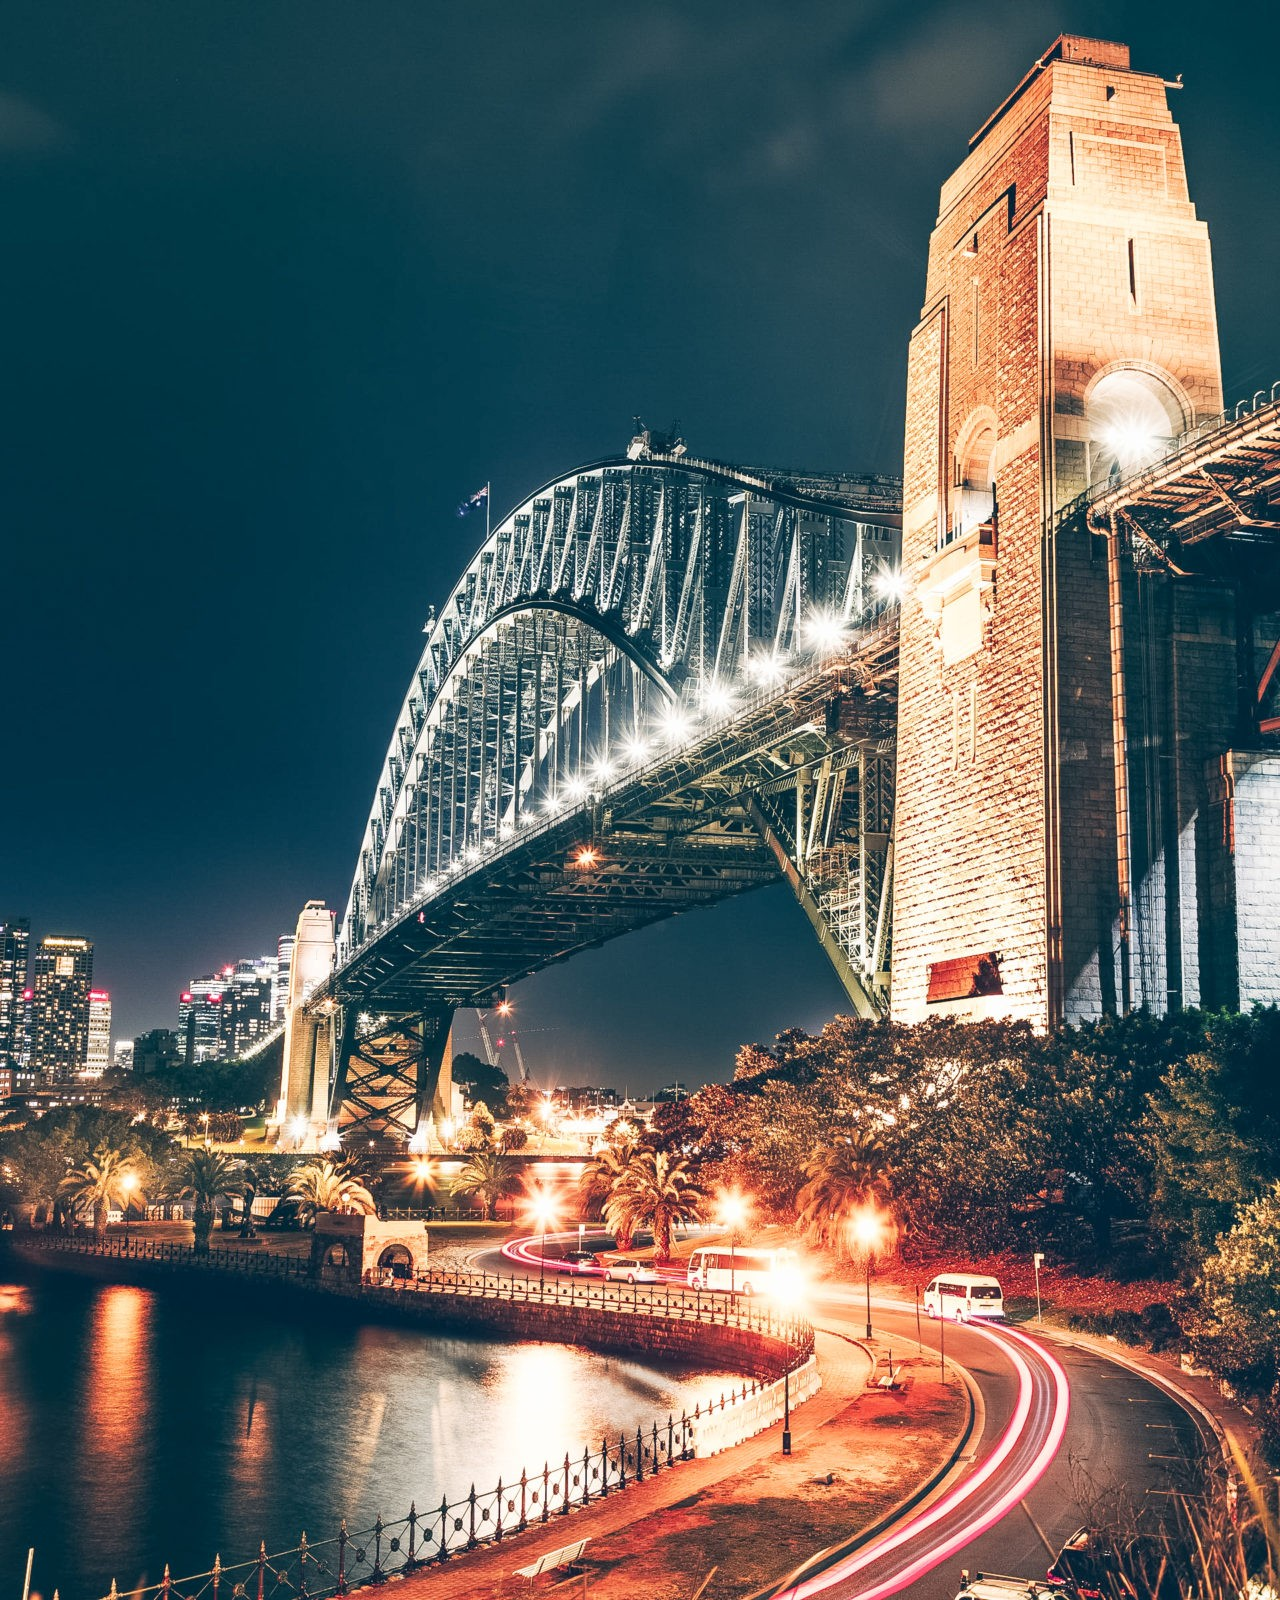 Sydney_bridg, Australia